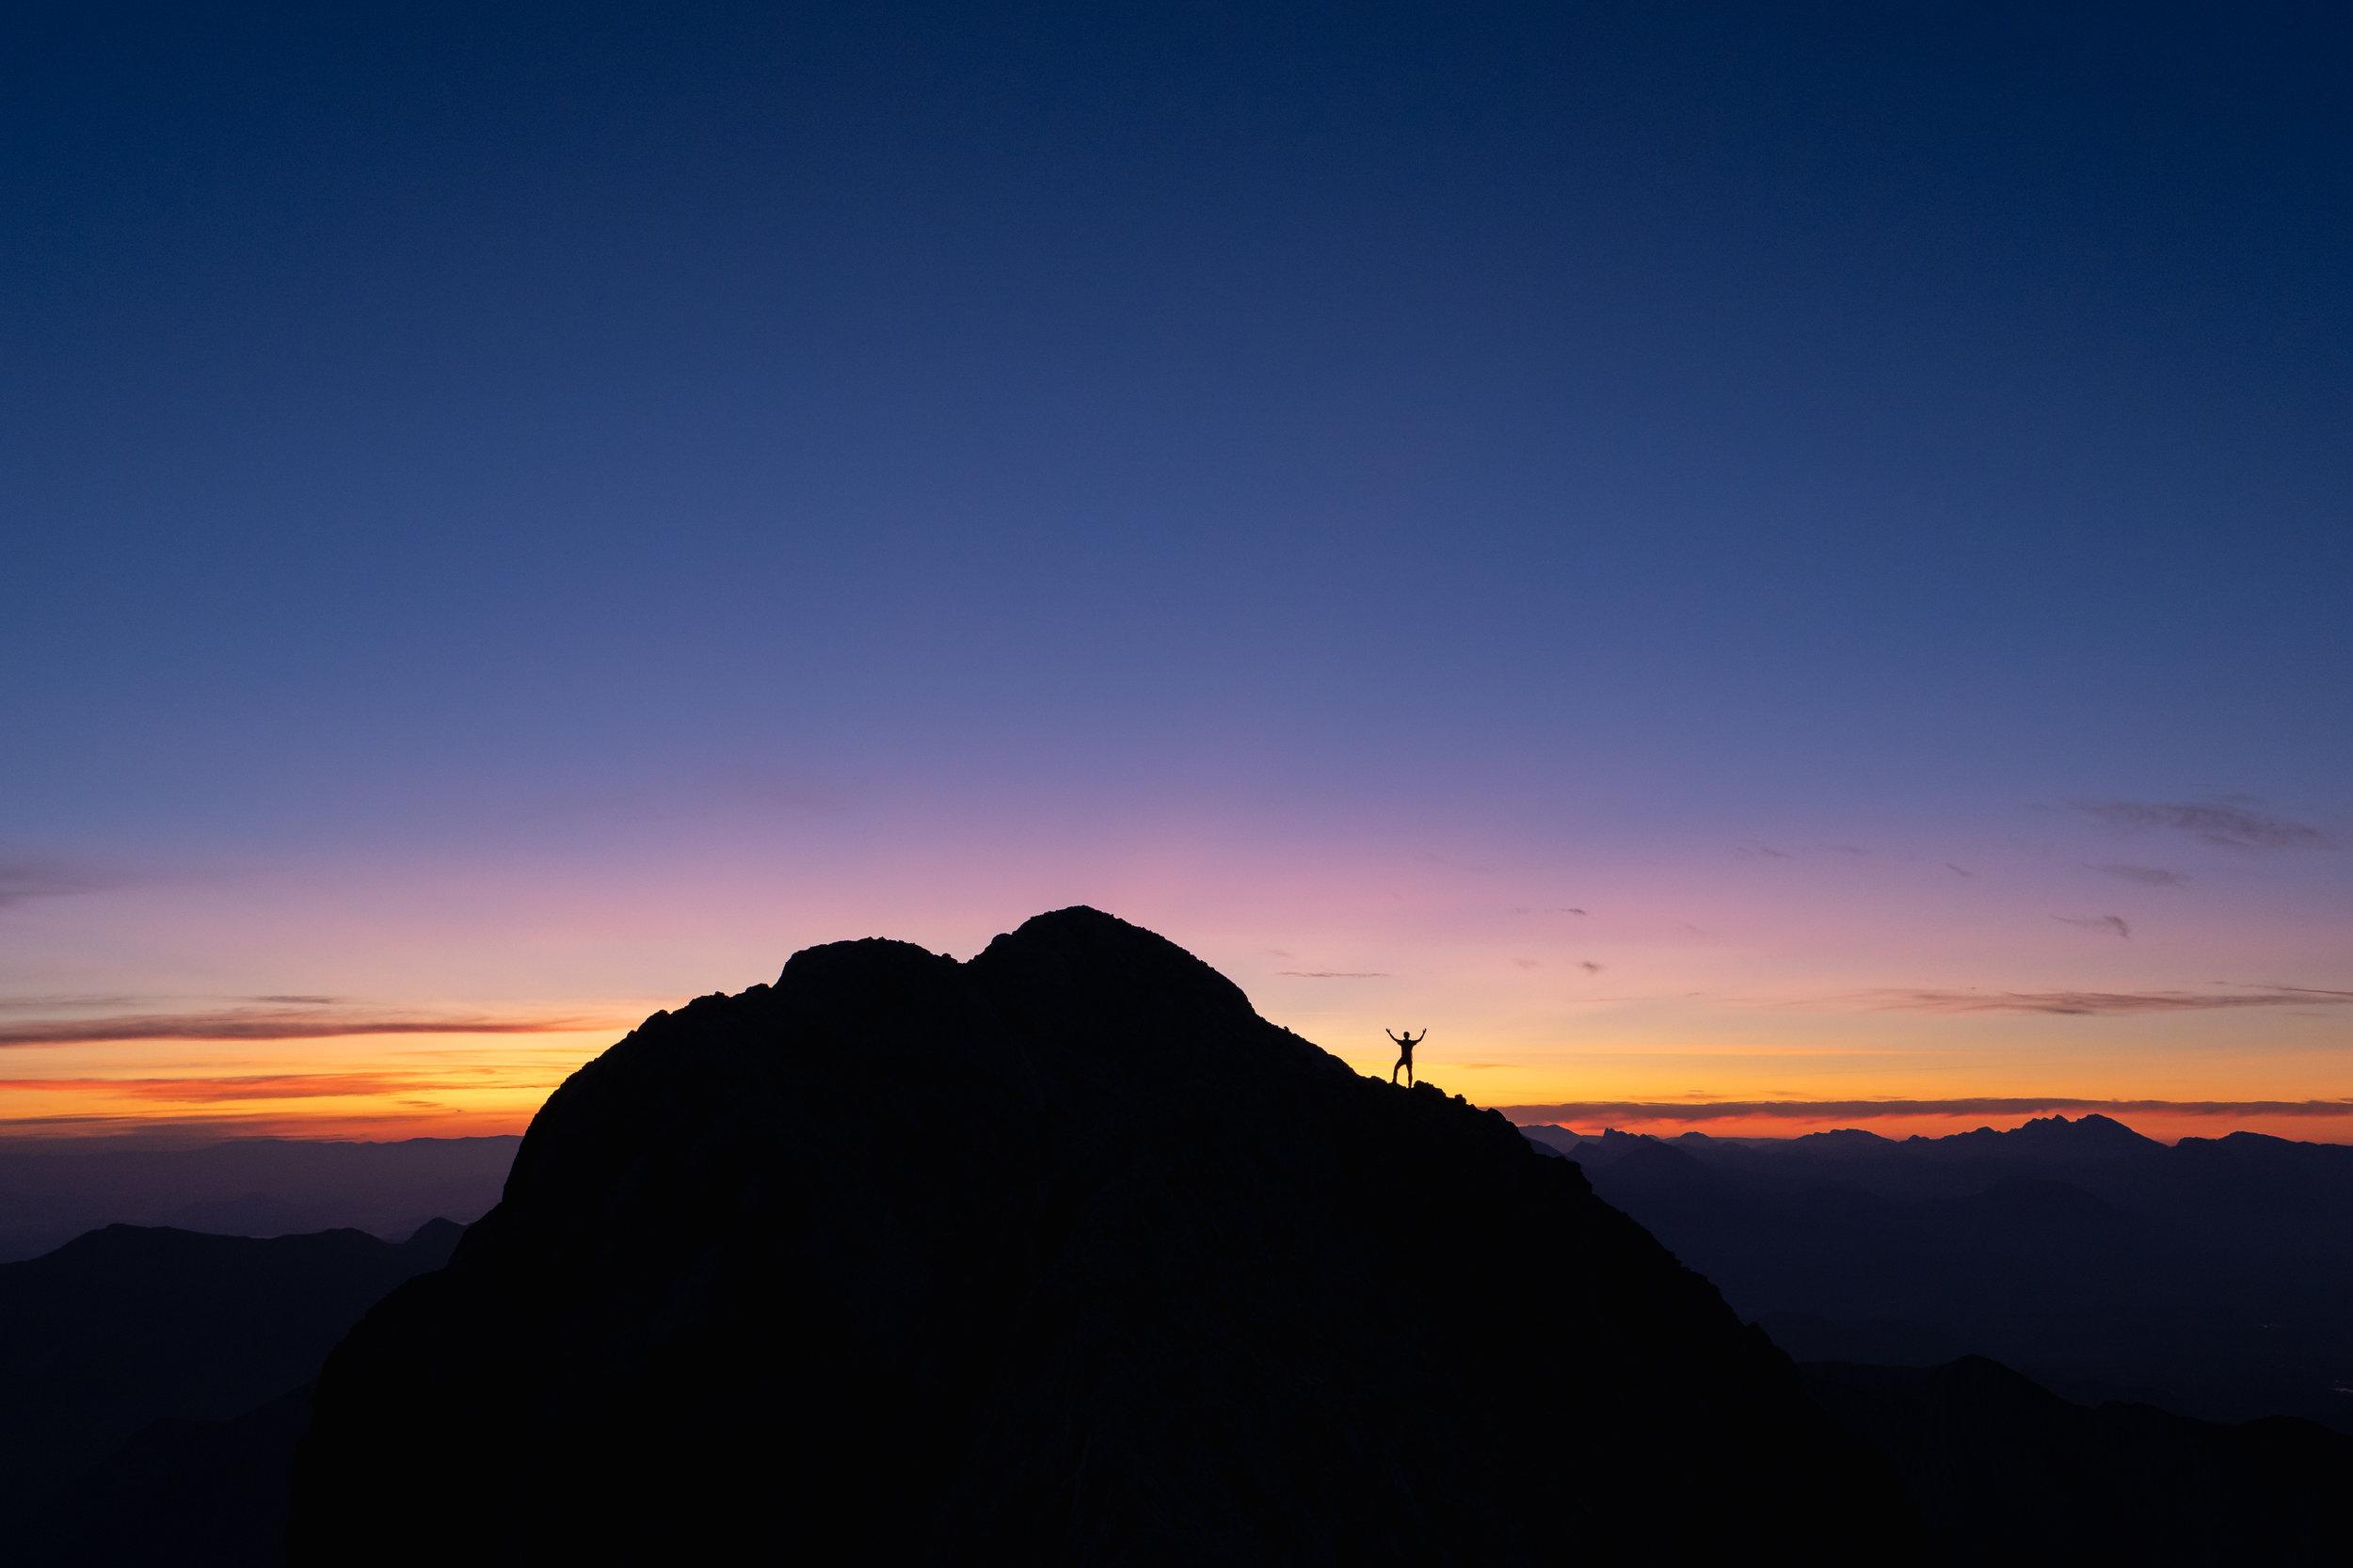 Luka under the summit of Mt. Rjavina.